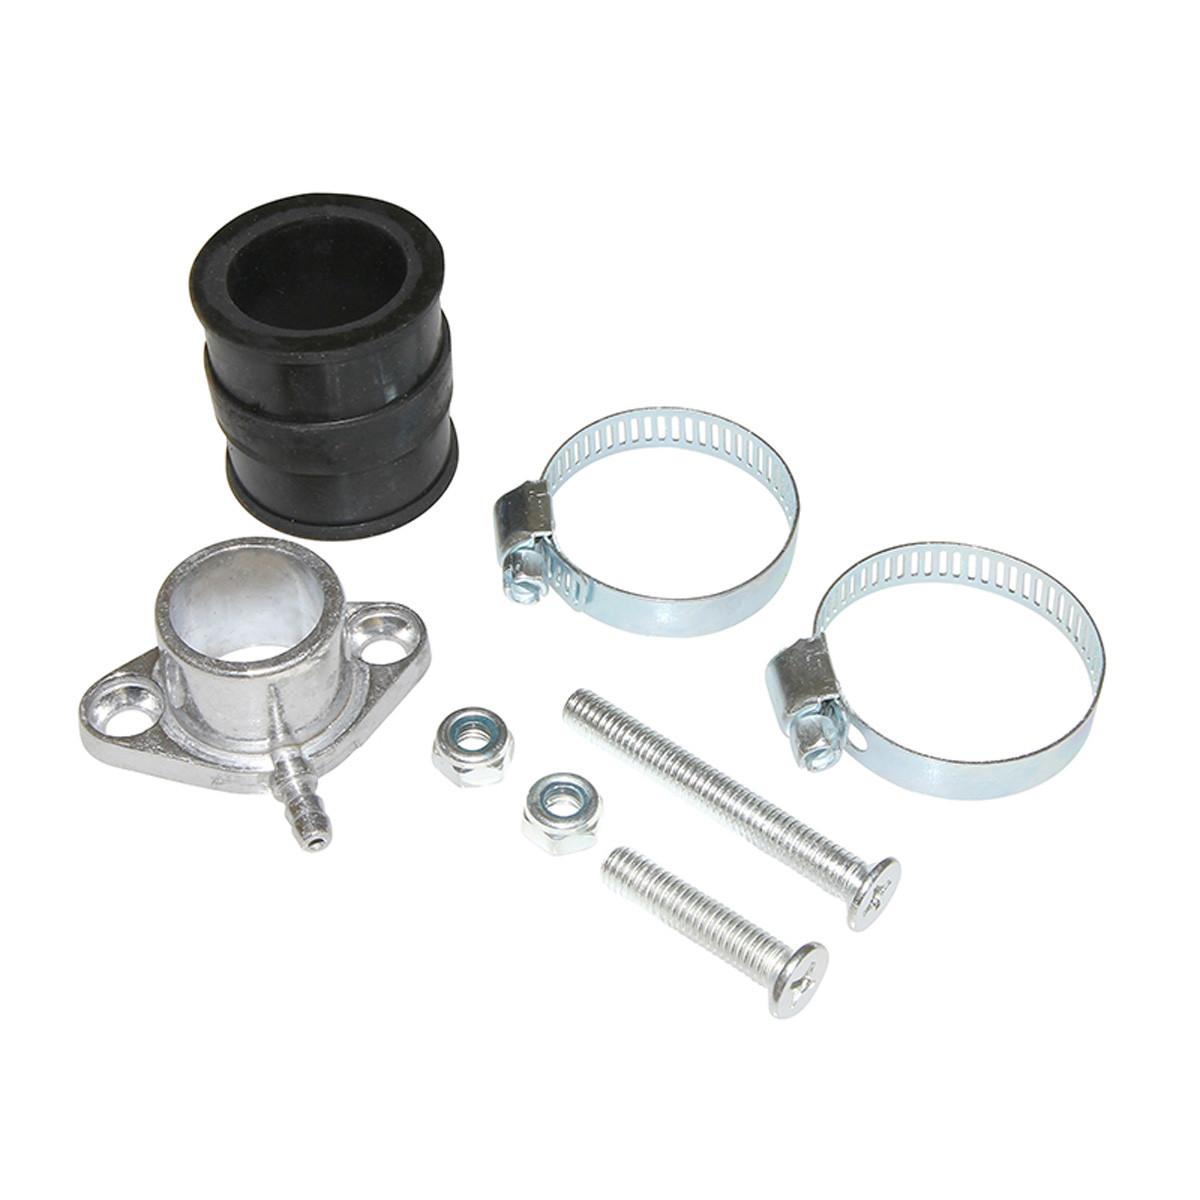 Pipe Admission Peugeot Buxy Speedfight TKR - Montage souple sur pipe d'origine